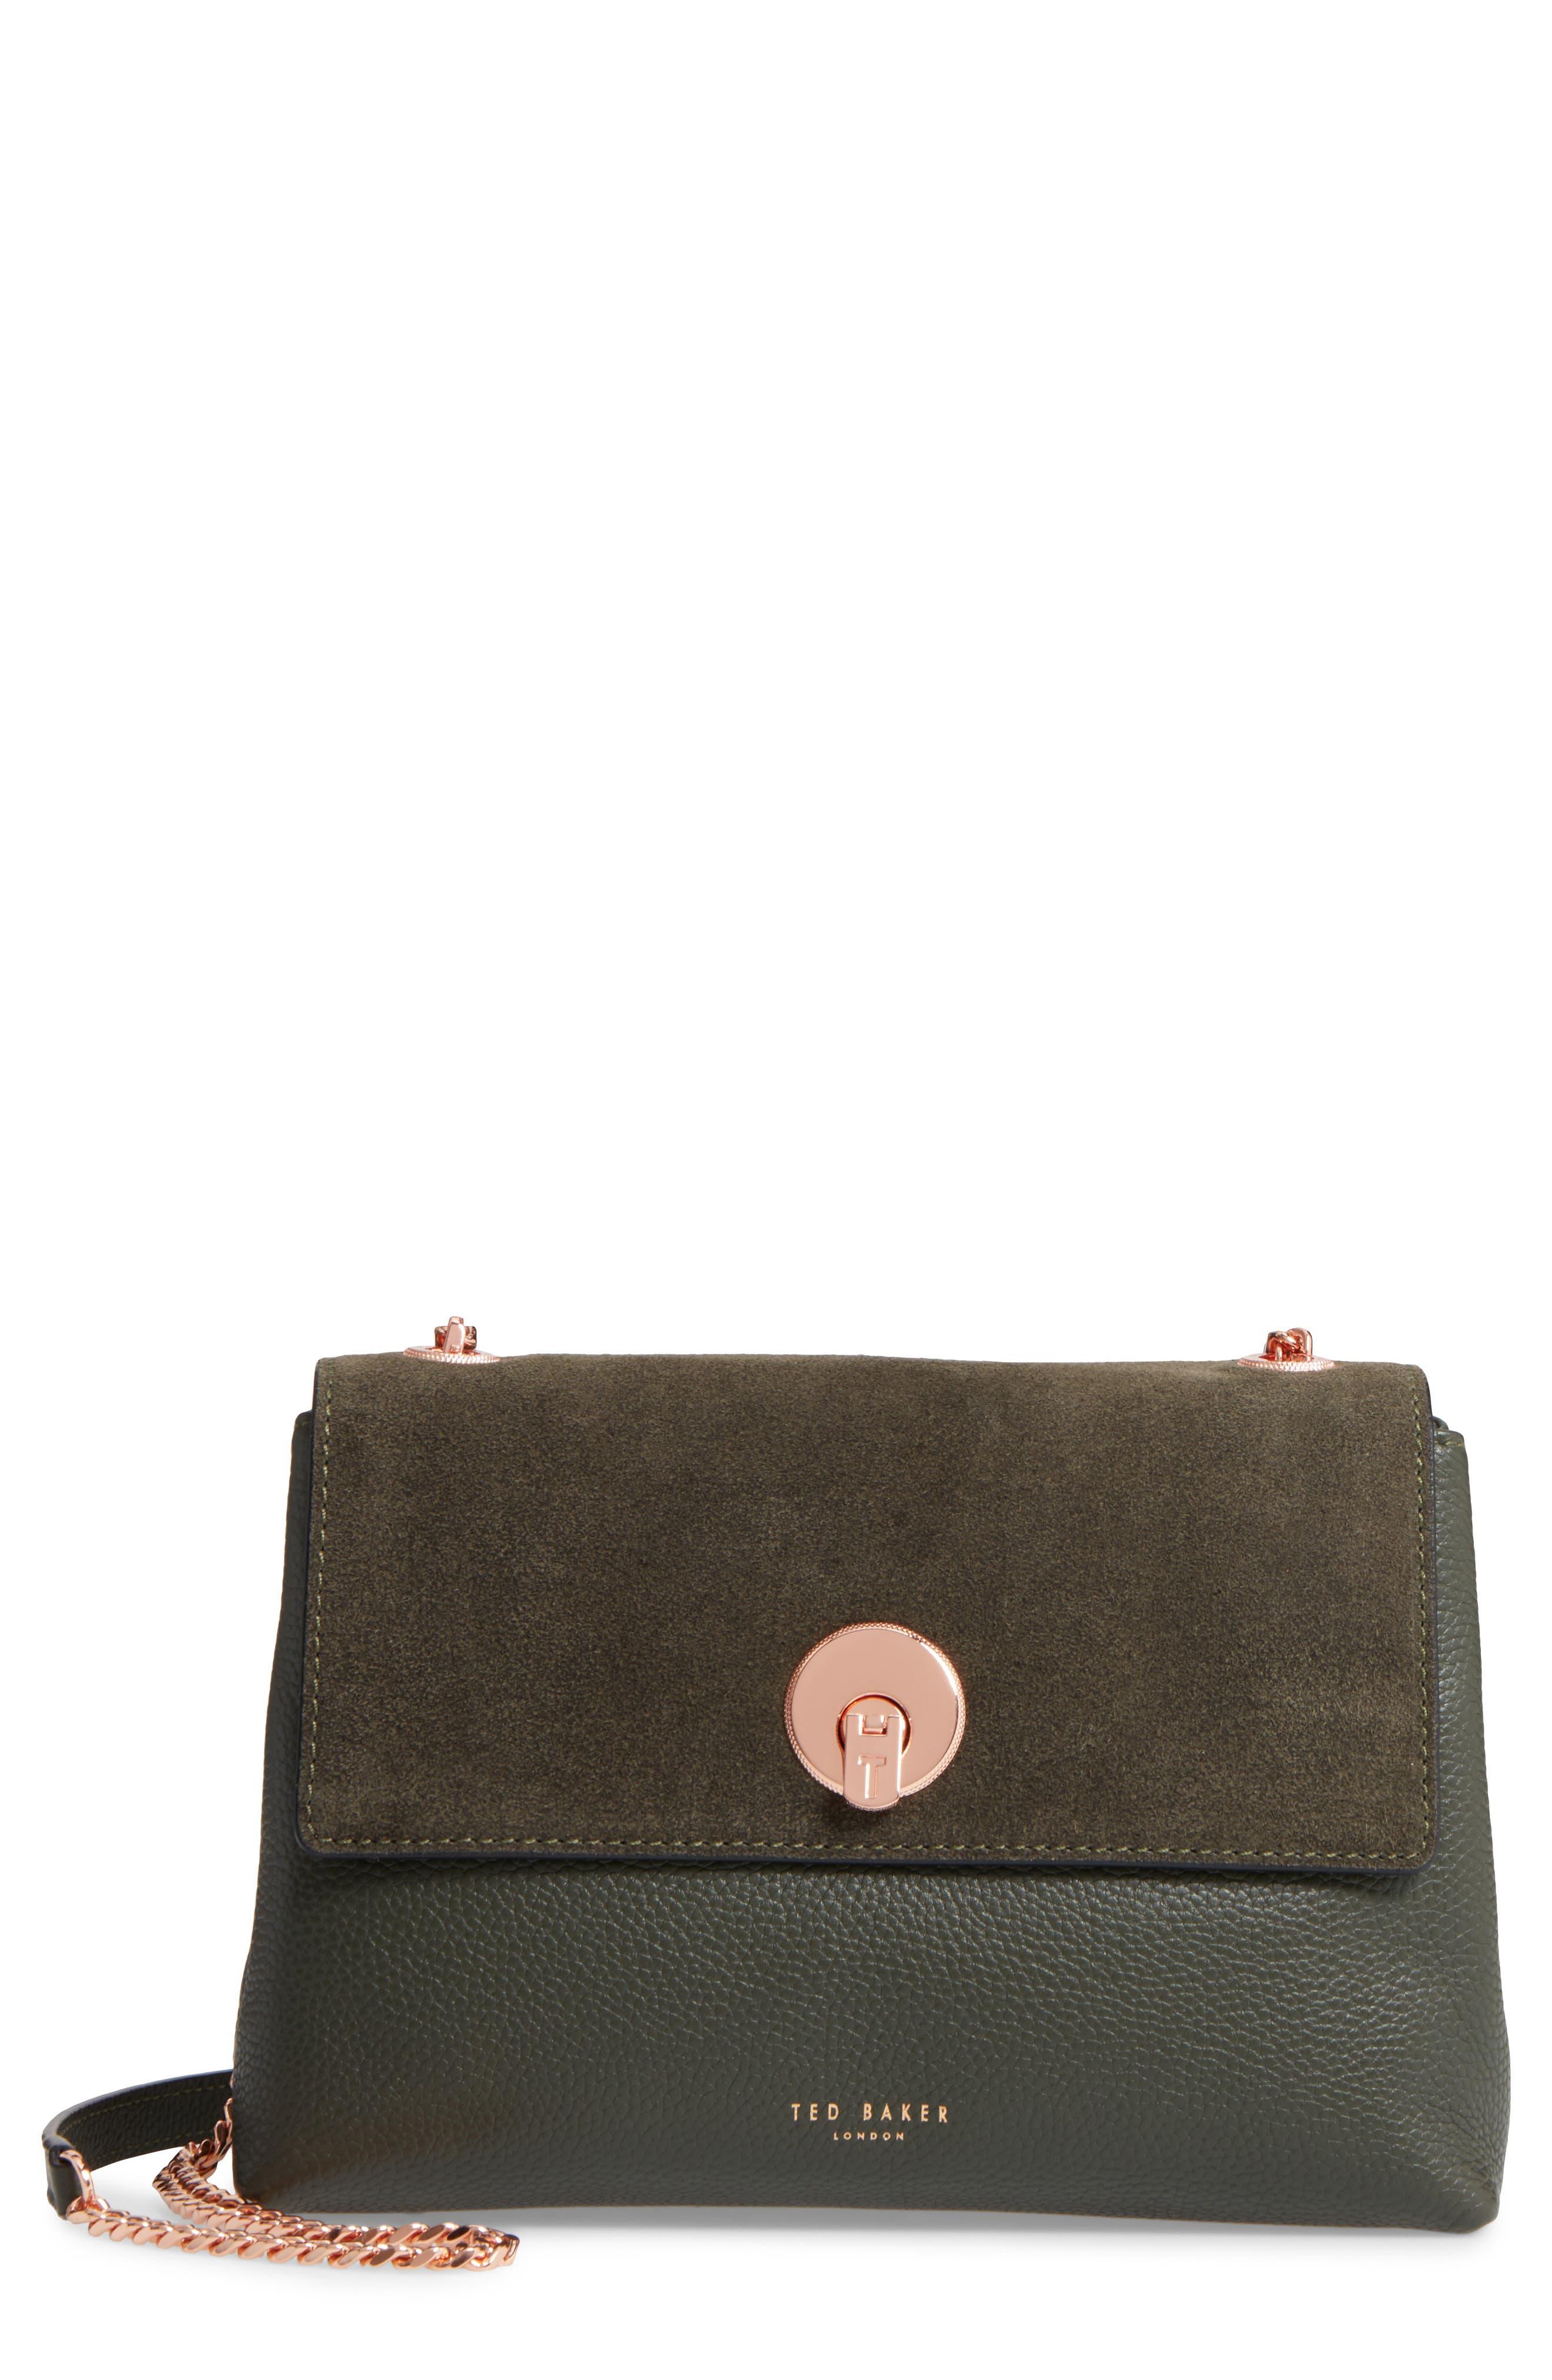 Alternate Image 1 Selected - Ted Baker London Sorikai Leather & Suede Crossbody Bag